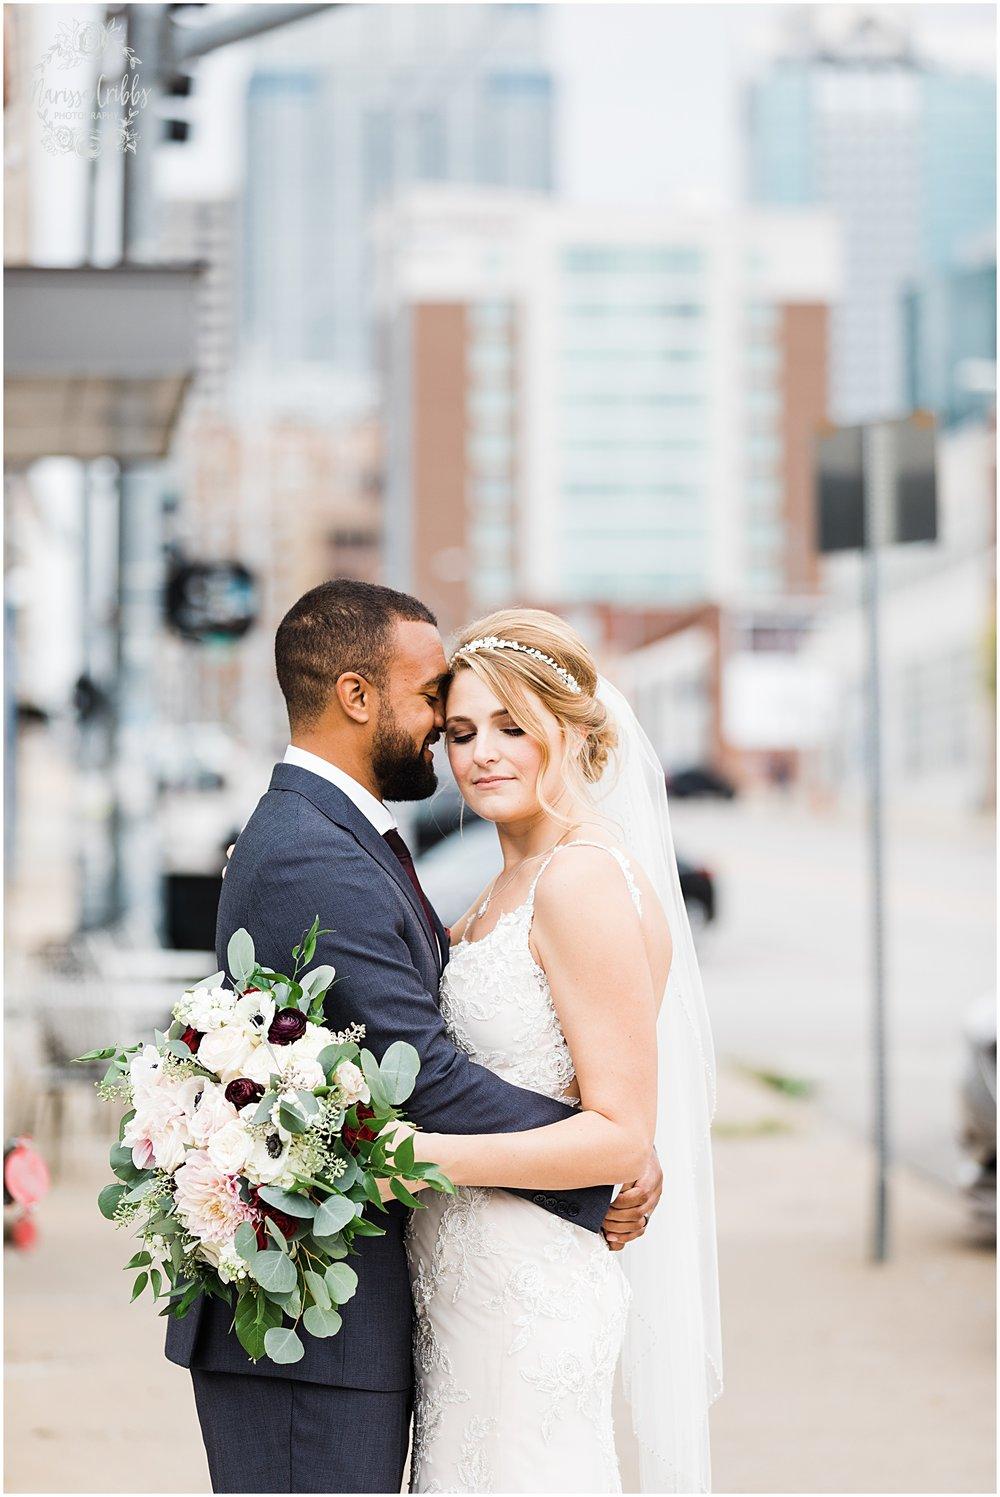 BAUER WEDDING | KELSEA & JUSTIN | MARISSA CRIBBS PHOTOGRAPHY_6531.jpg